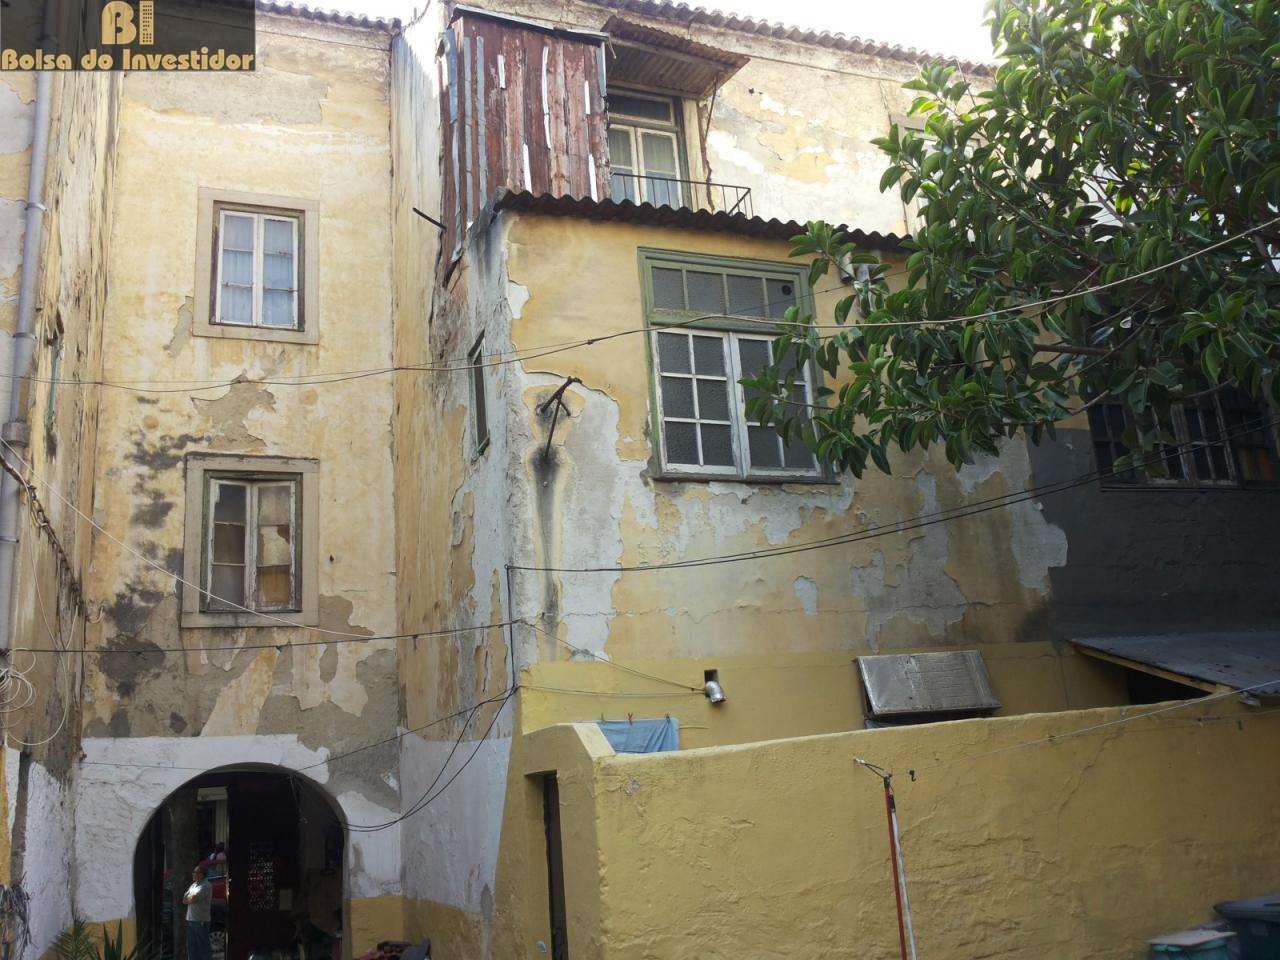 Prédio para comprar, Arroios, Lisboa - Foto 8